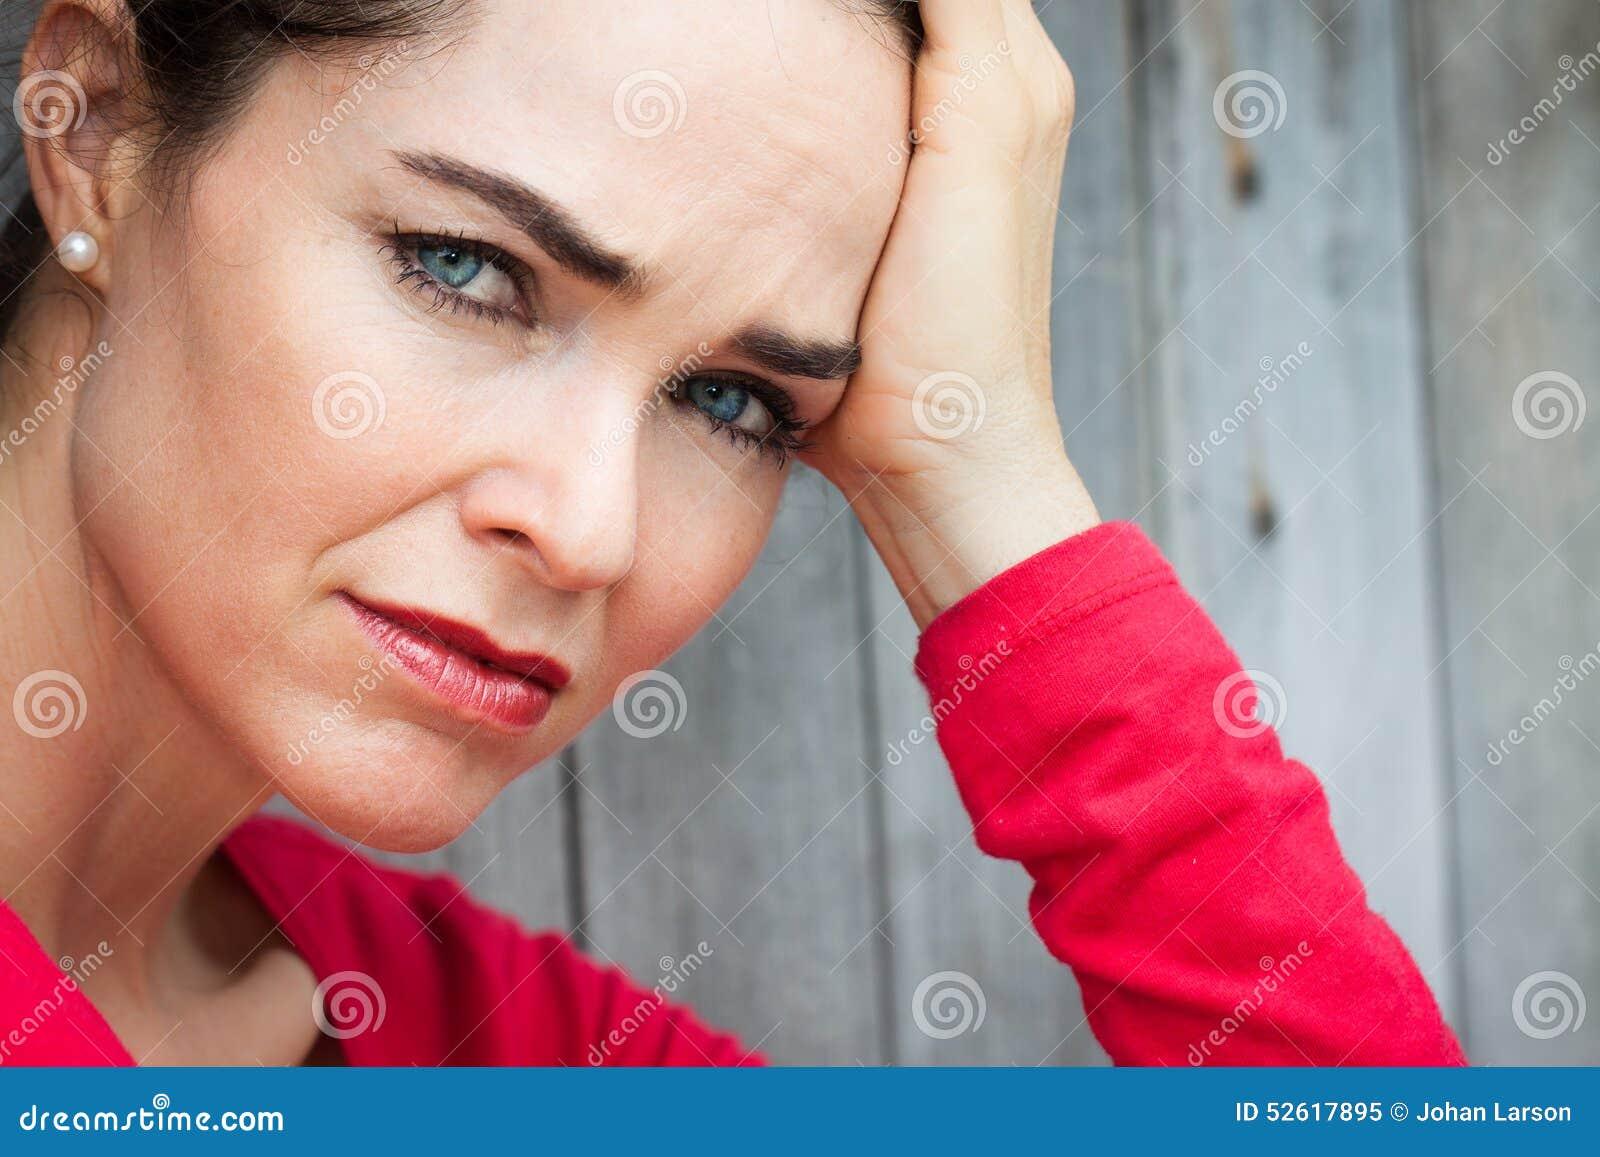 Close-up of sad and depressed woman